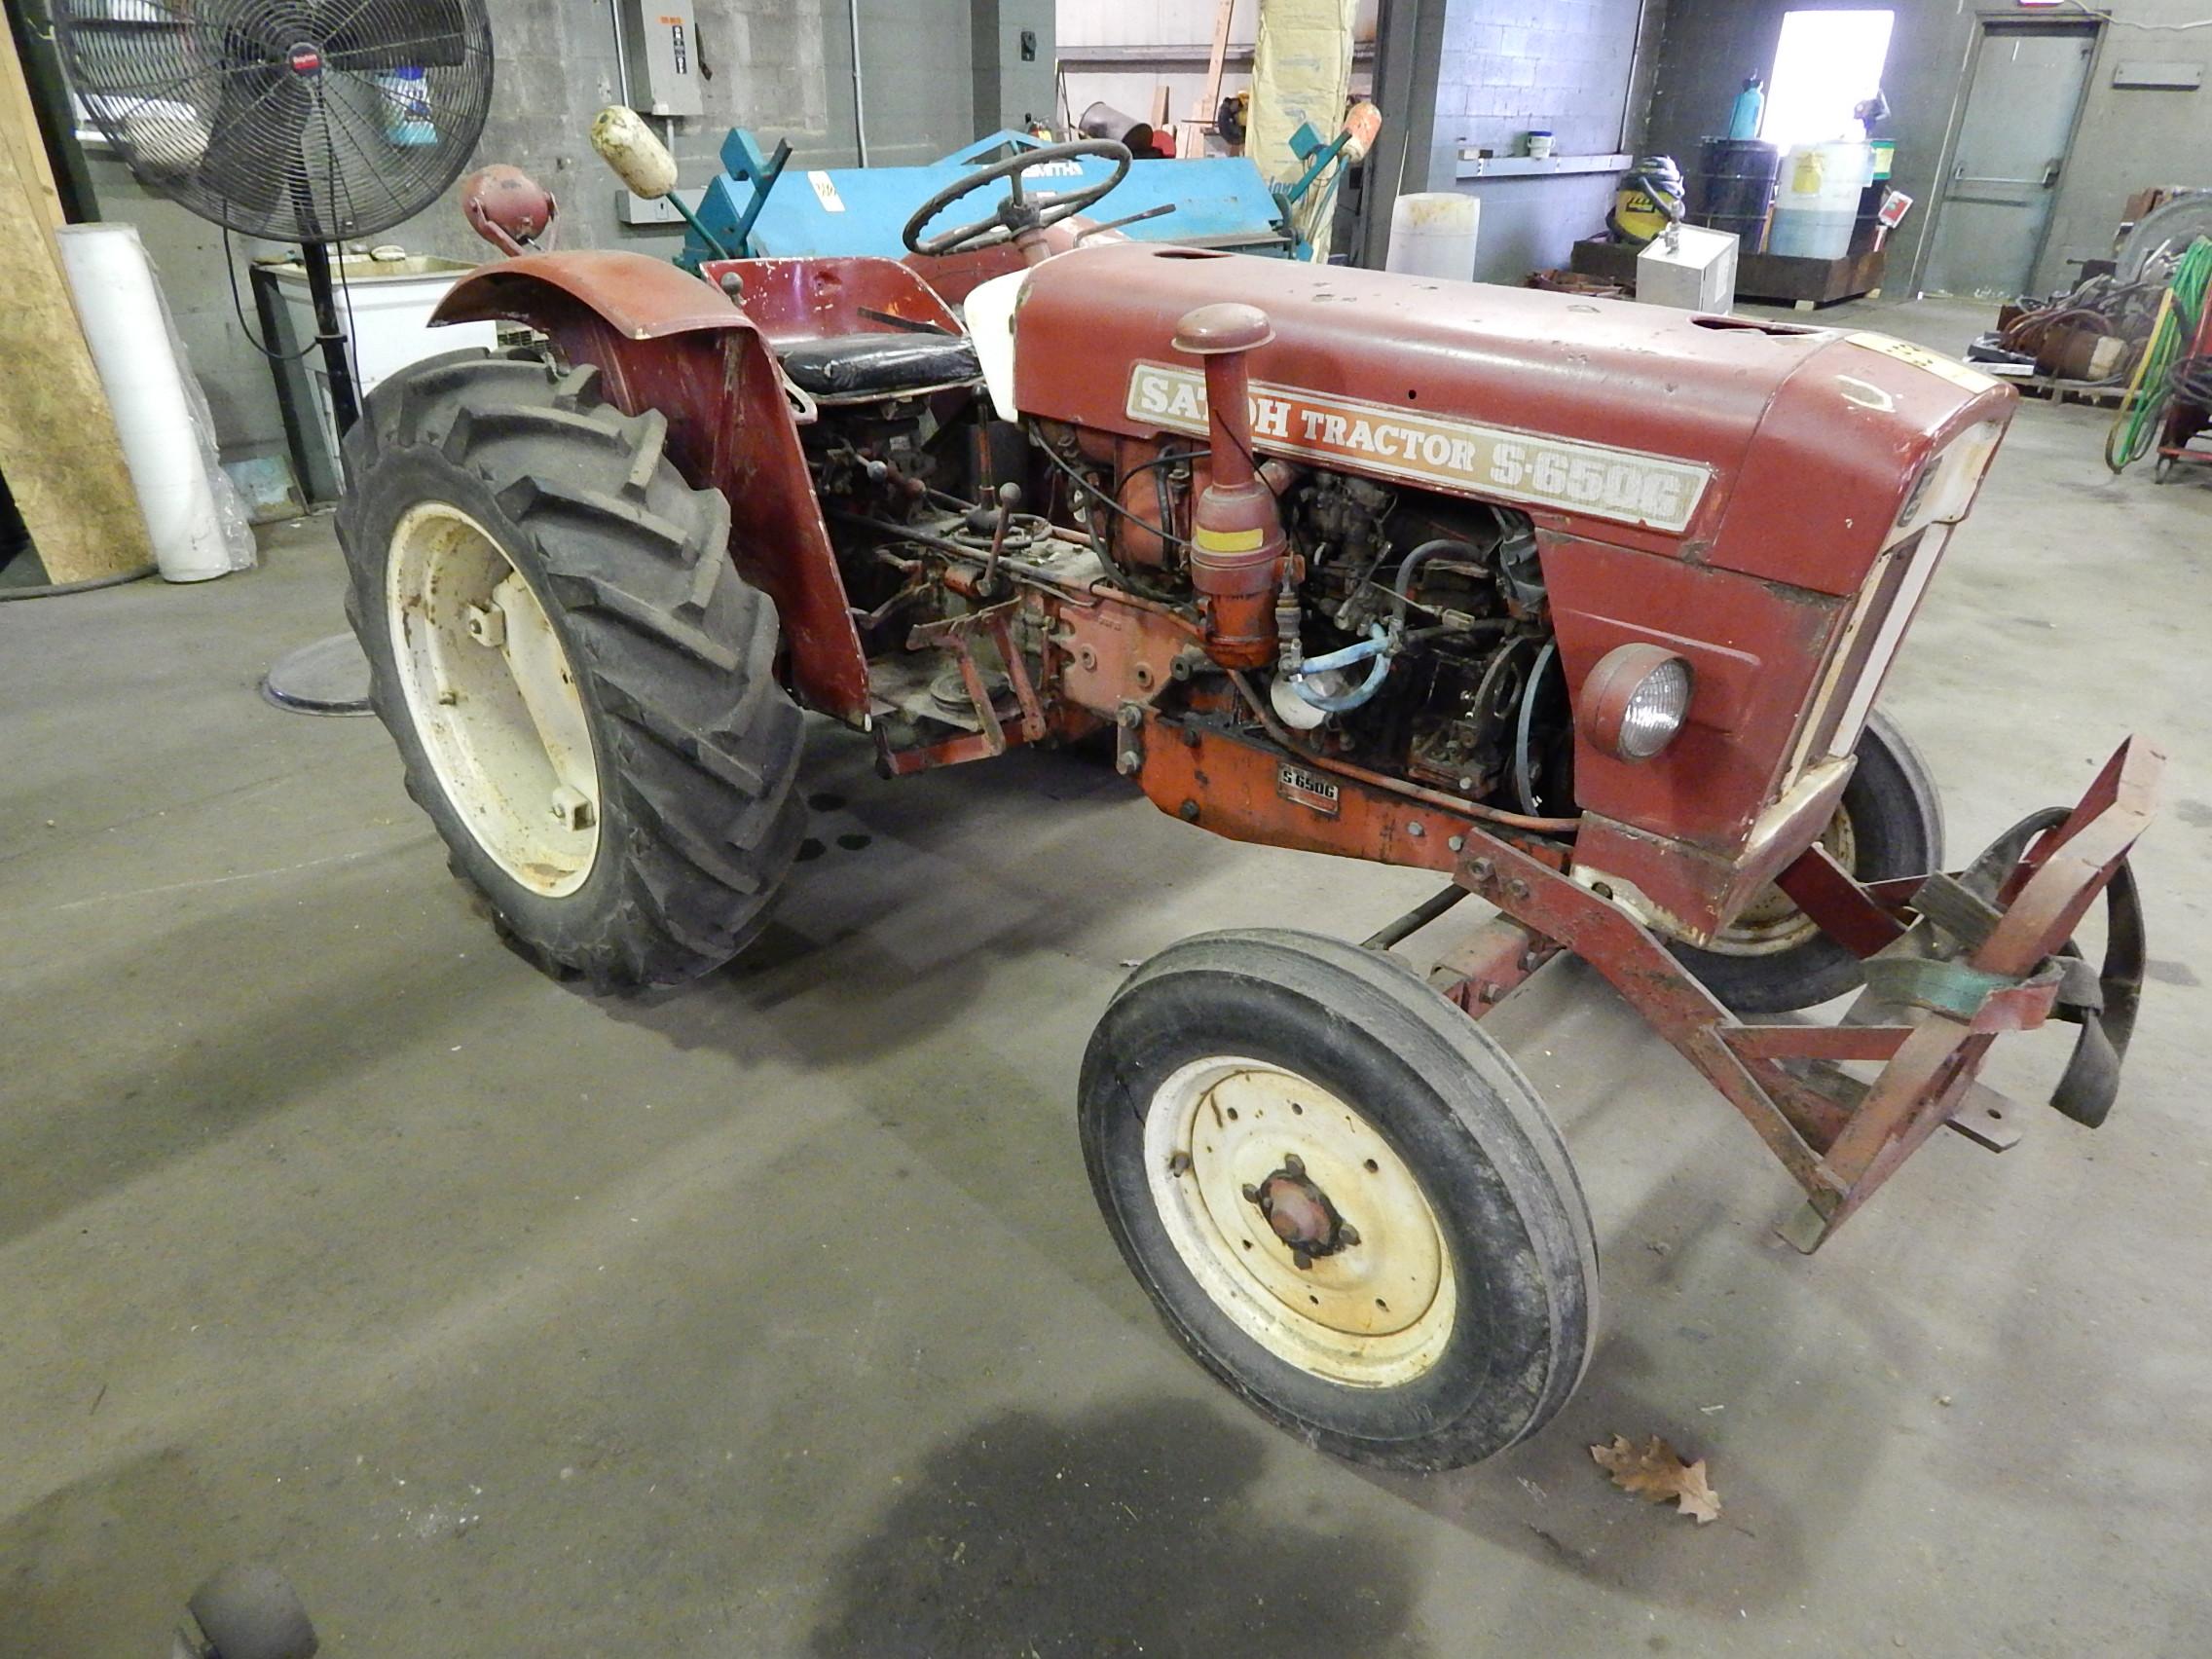 satoh tractor 4 cylinder engine diagram satoh model s-650g tractor, 4 cylinder gas engine, 2 wd ...